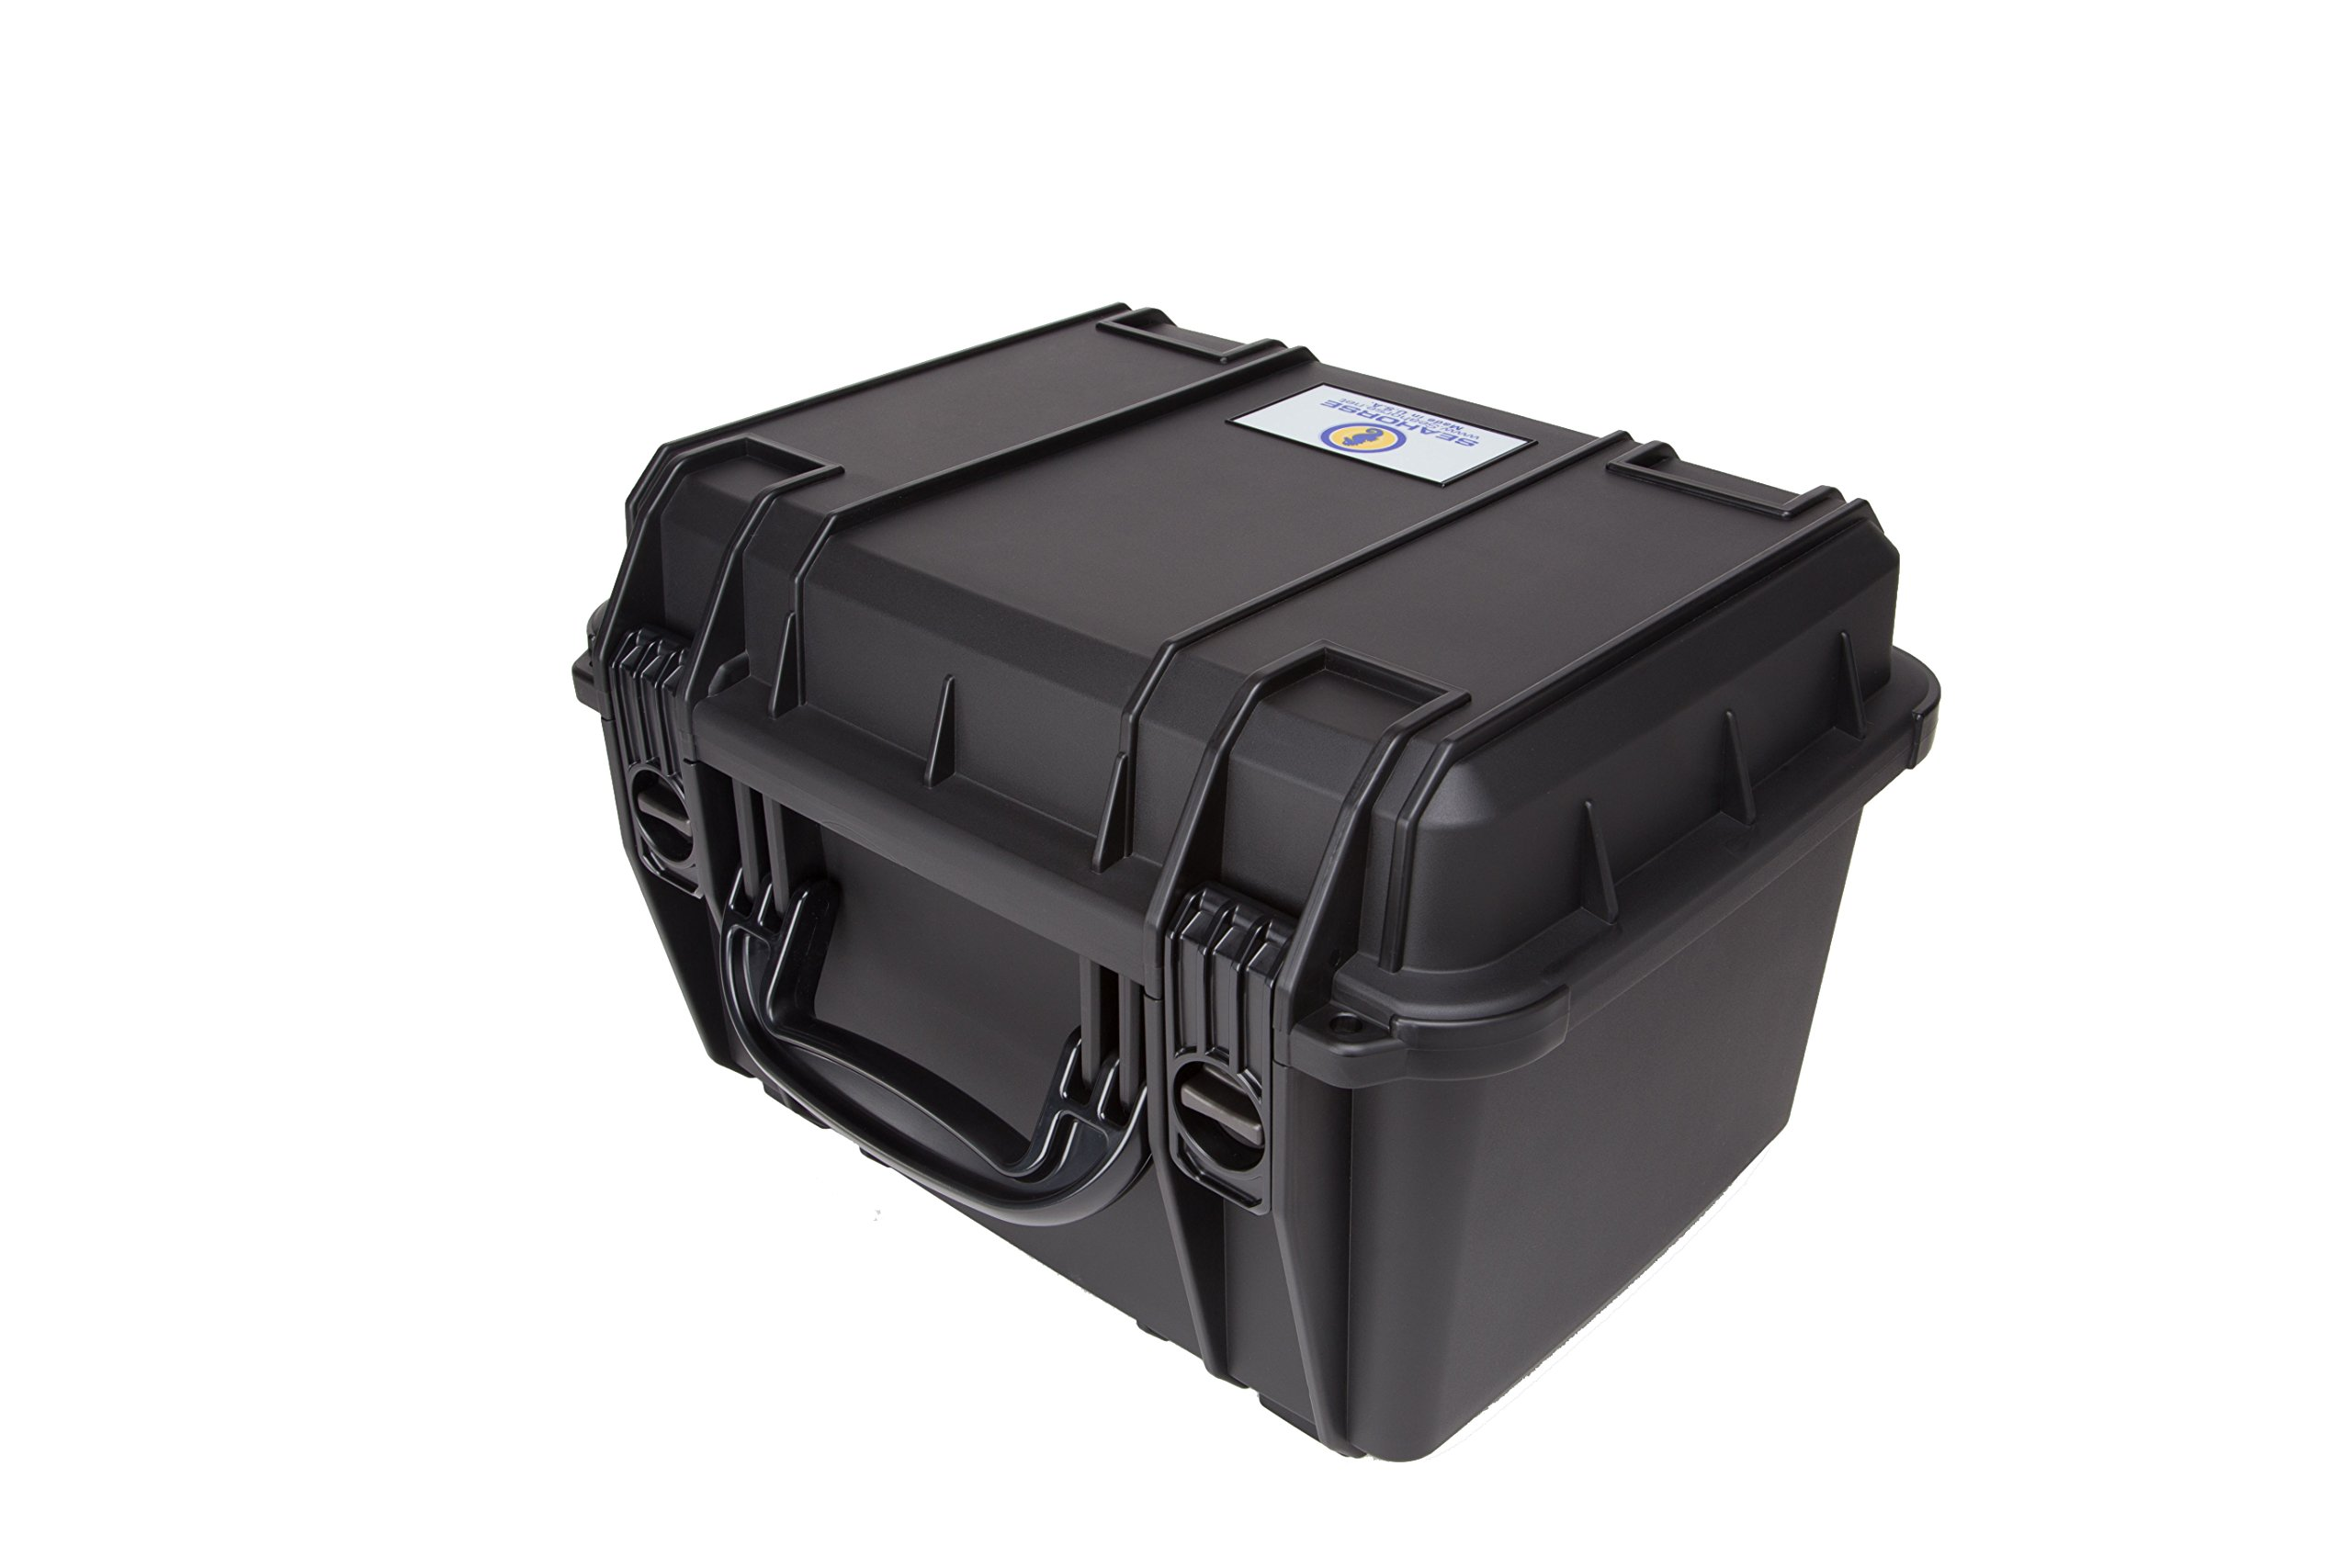 Seahorse SE540 Protective Case without Foam (Black)